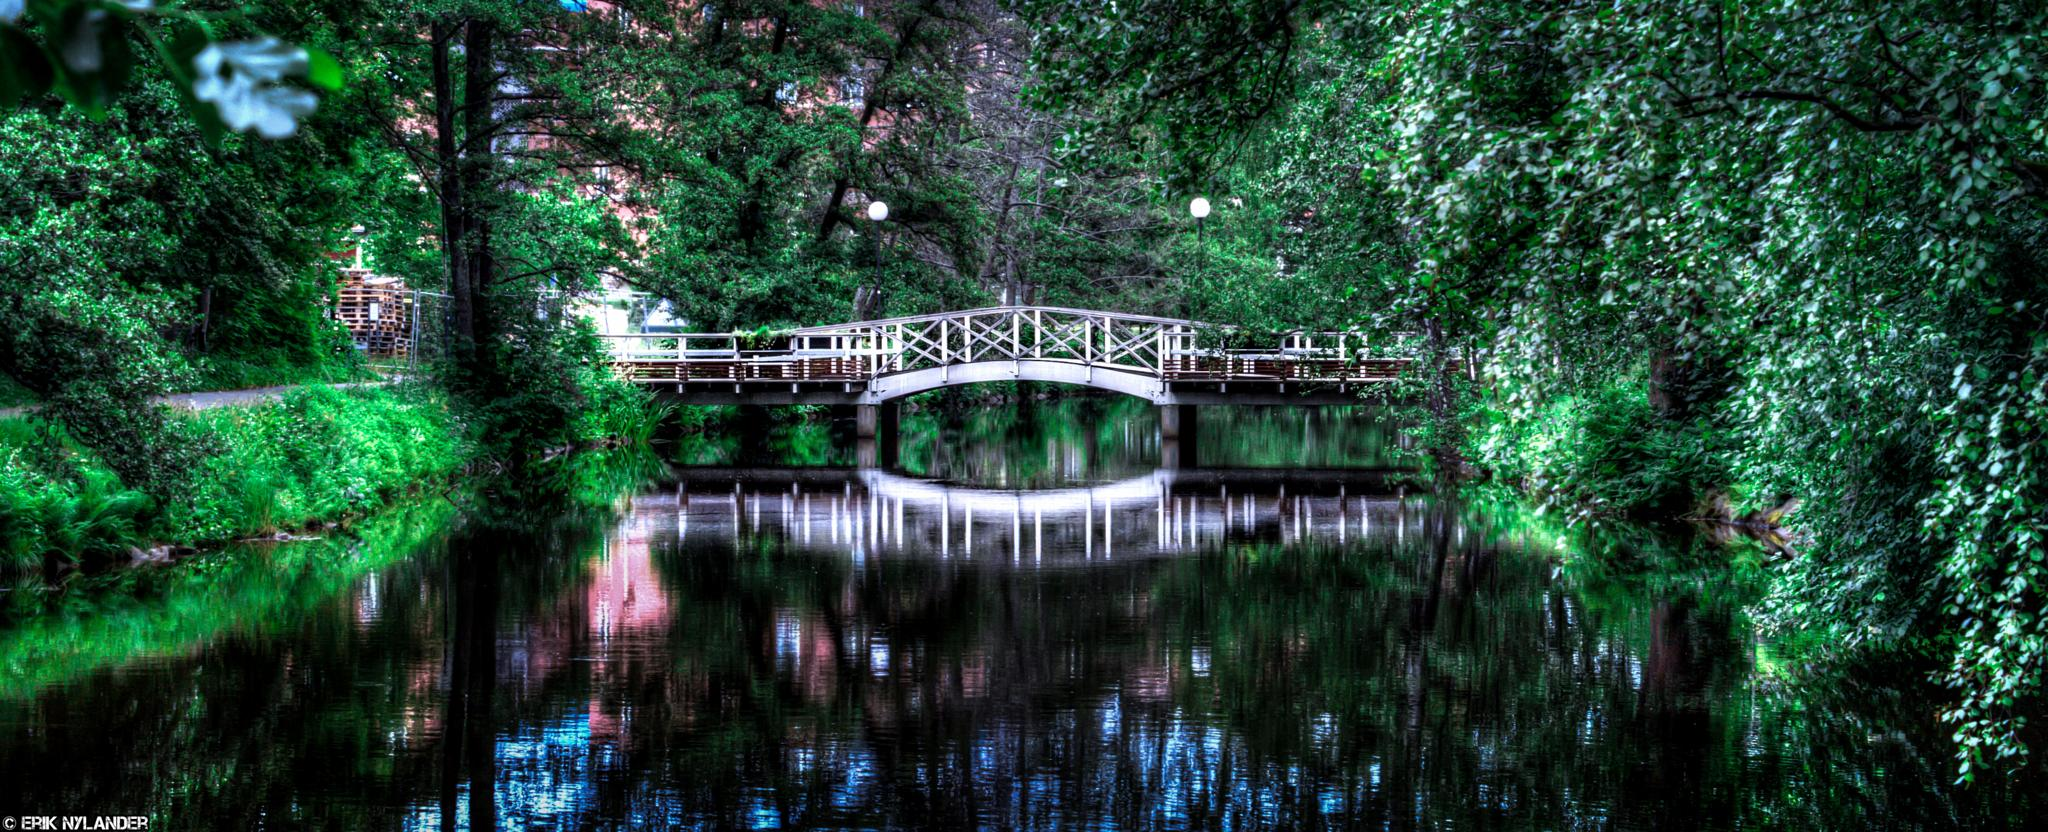 Reflection bridge by Erik Nylander